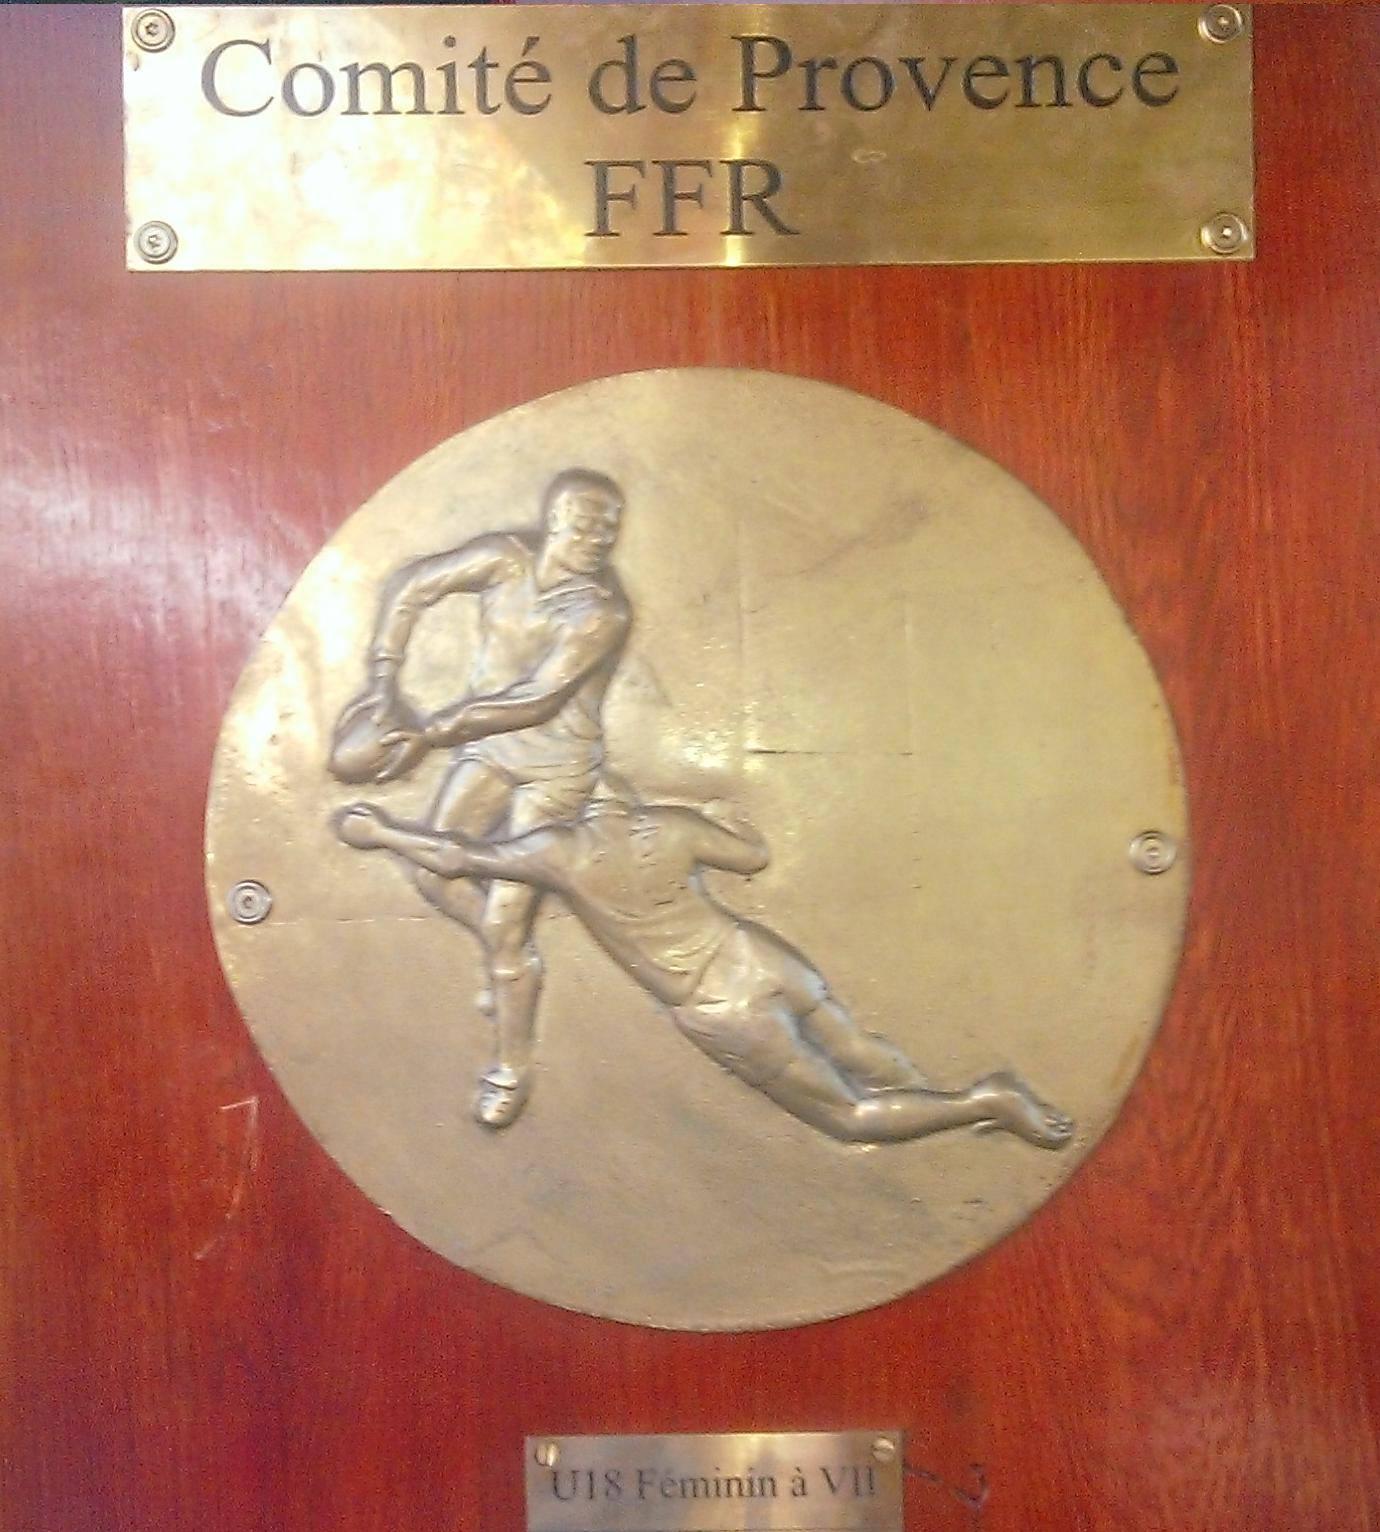 Finales territoriales comité de Provence 2017